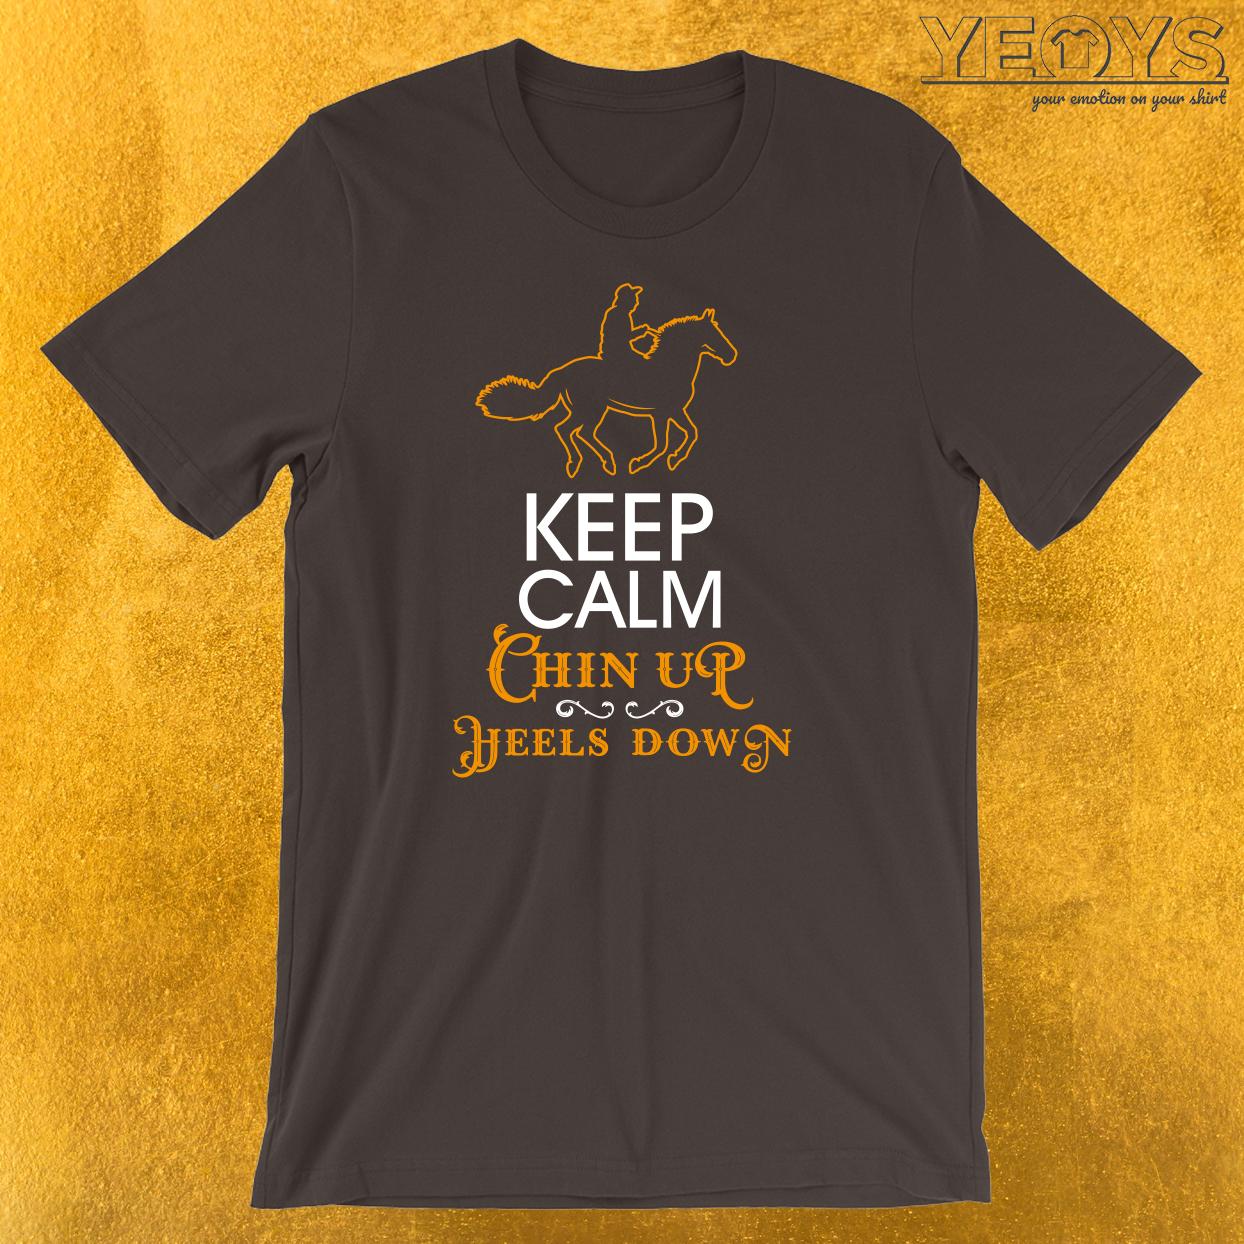 Keep Calm Chin Up Heels Down T-Shirt